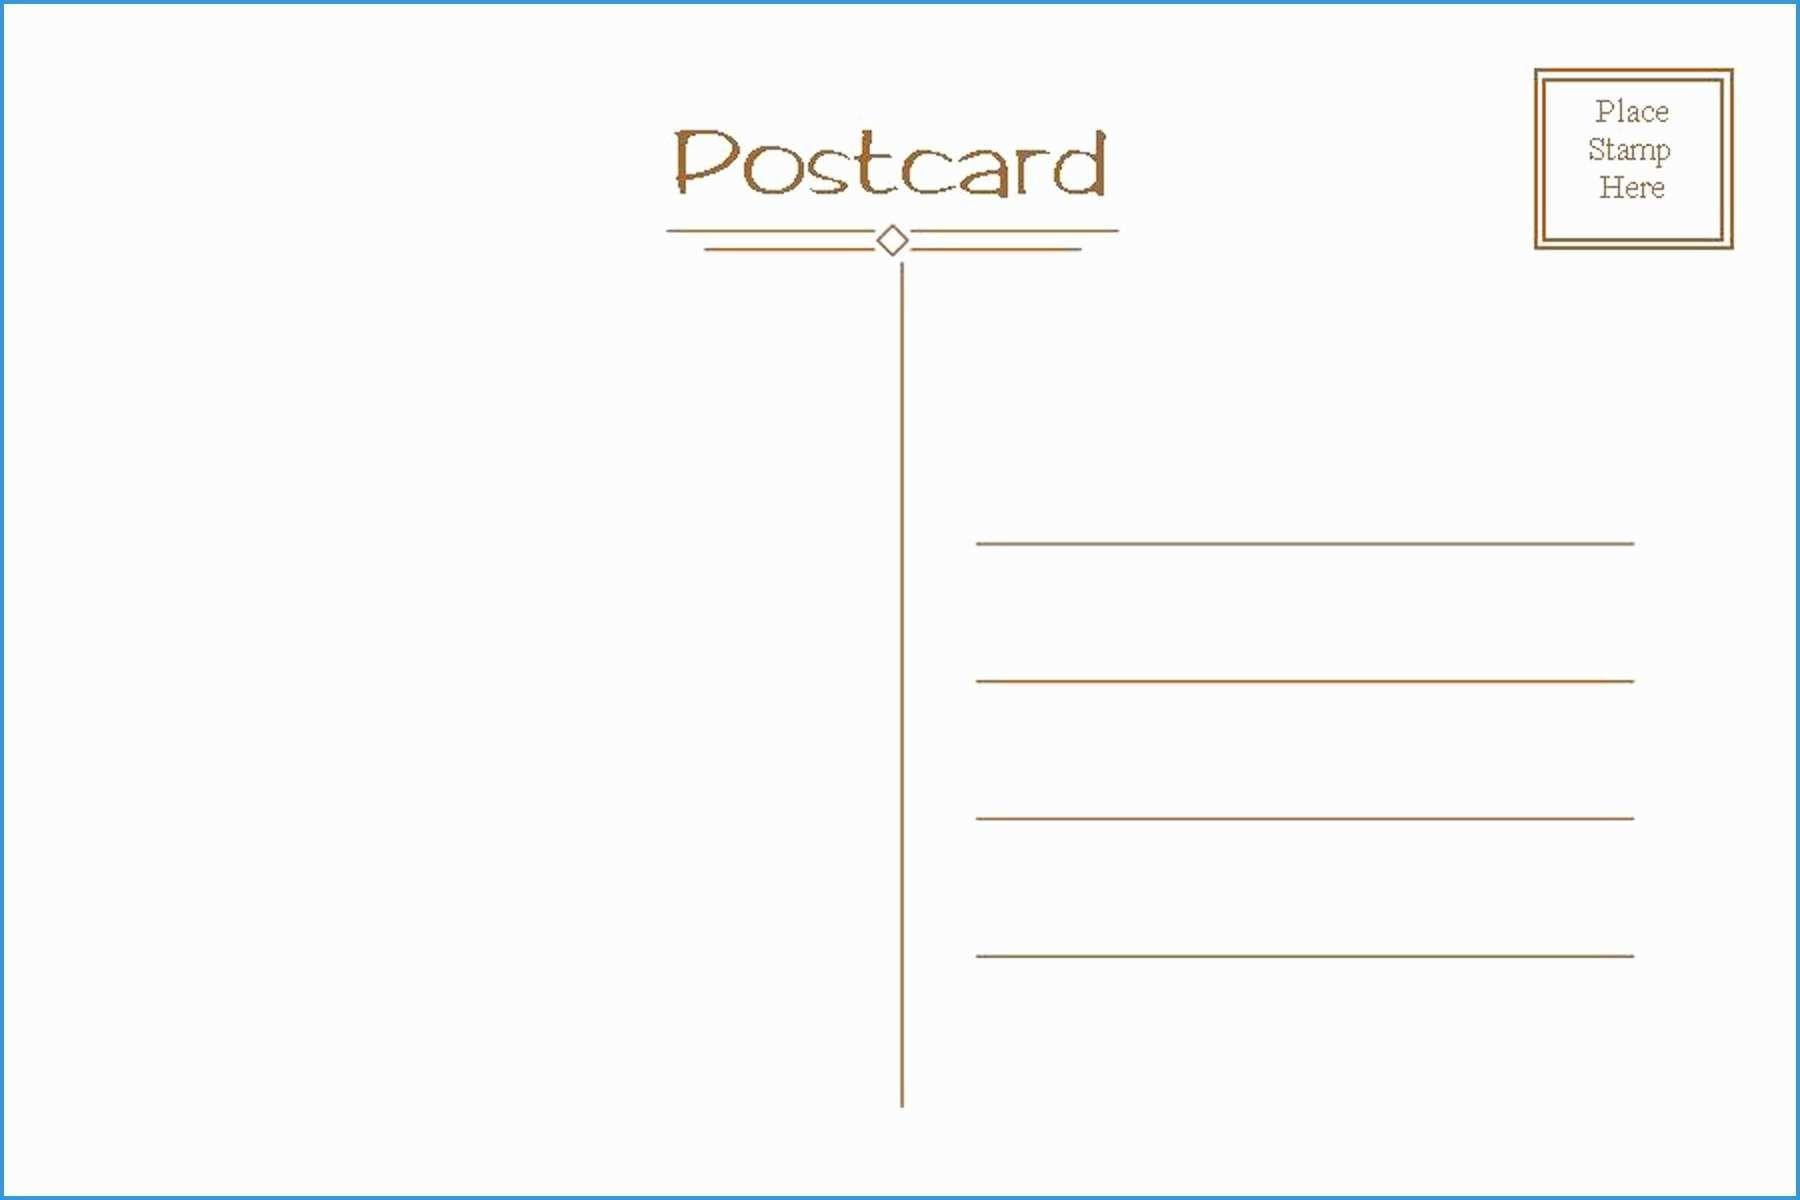 Free Postcard Template Elegant Postcard Template Free